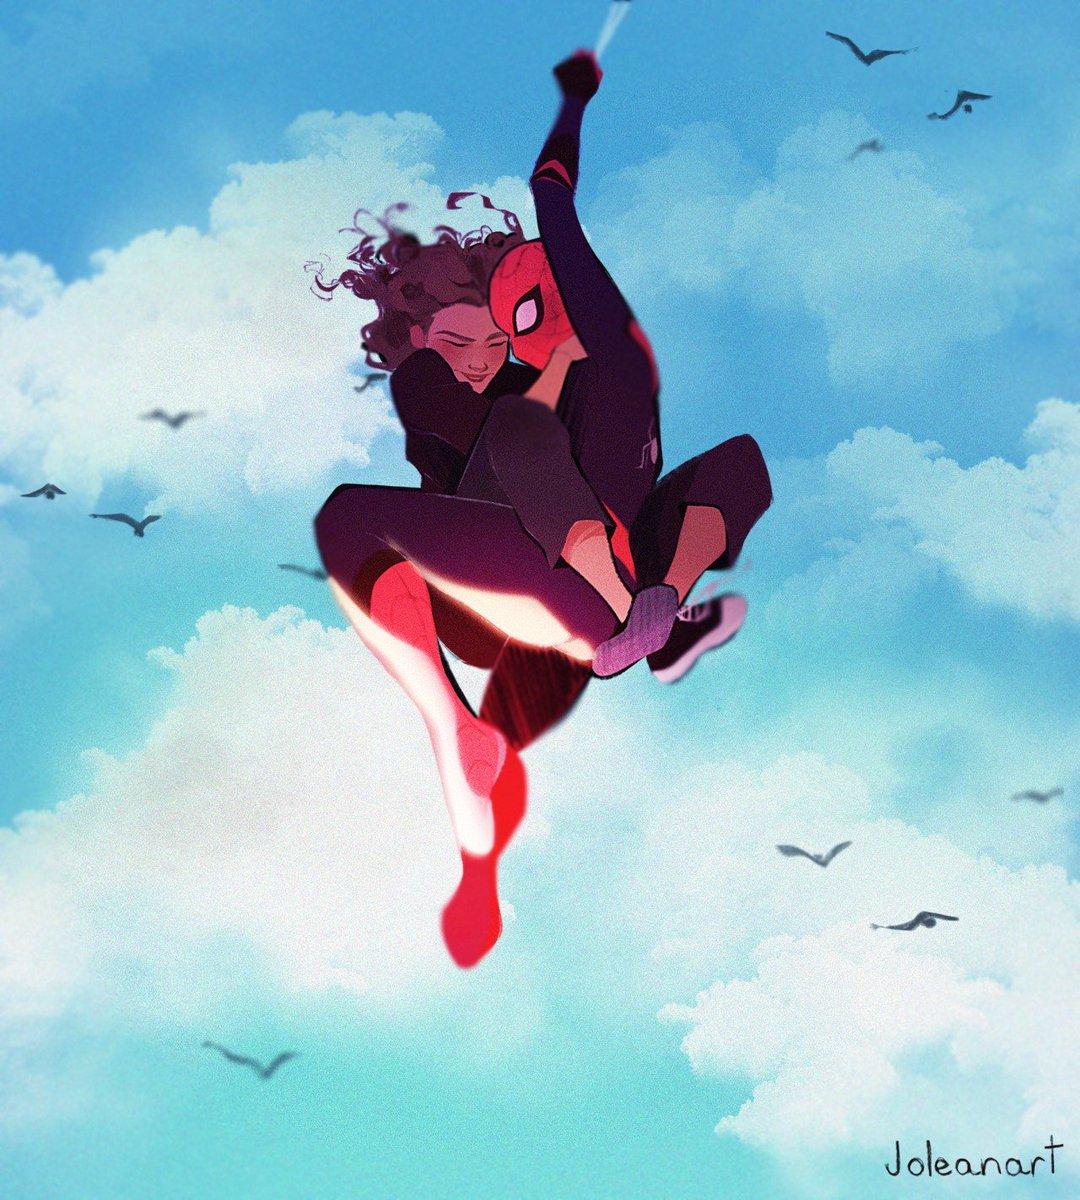 the new pics just killed me ❤???????? #spiderman